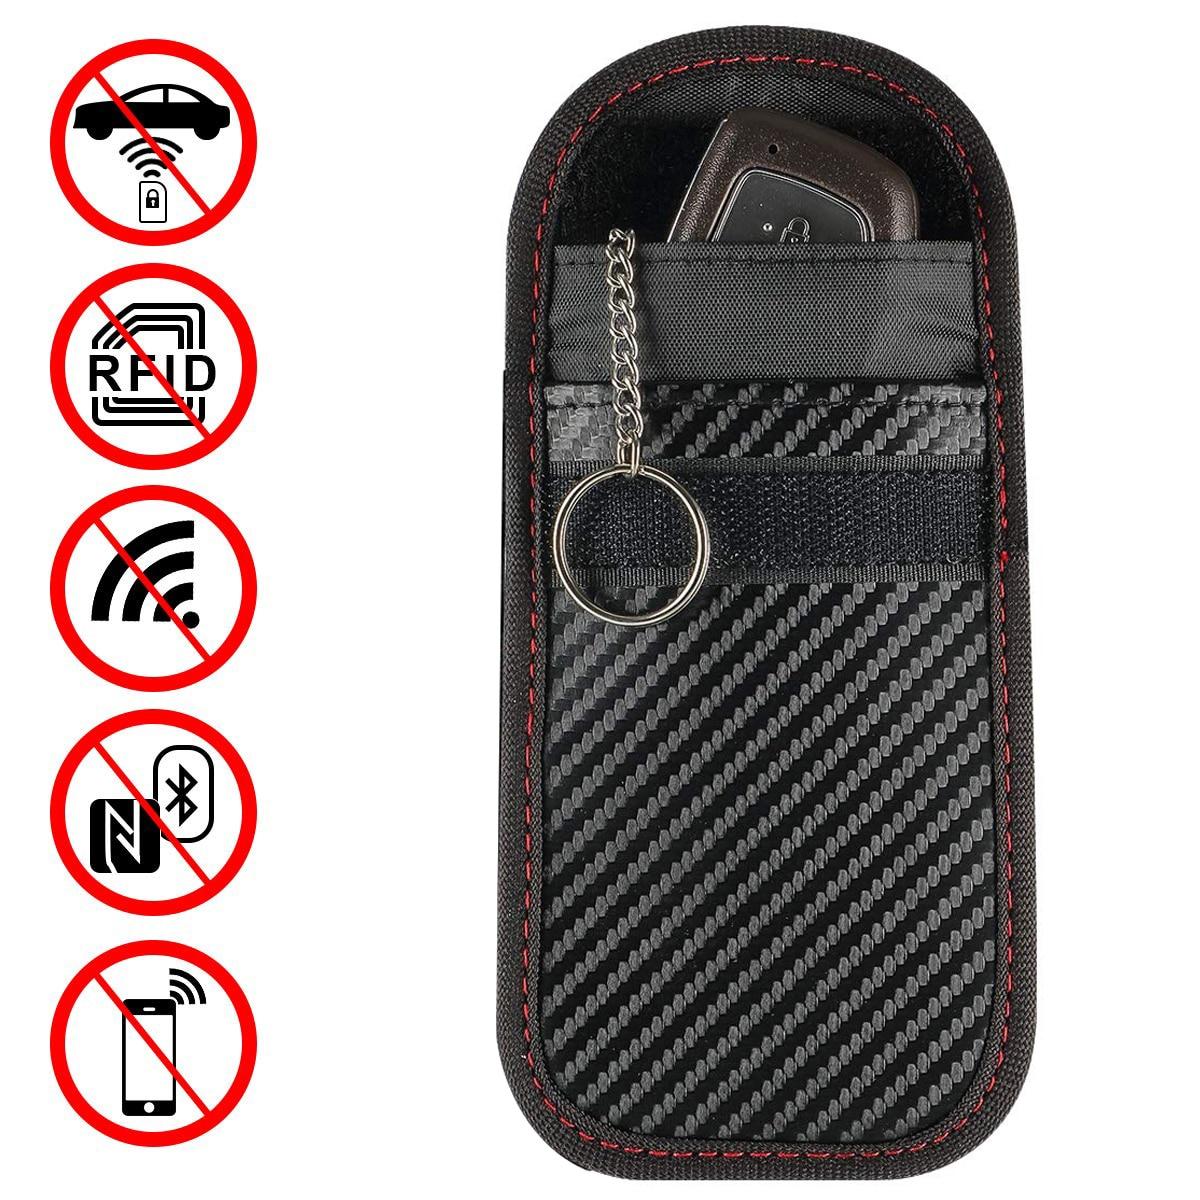 1pc/2pcs Portable Signal Blocker Car Key Case Faraday Cage Keyless Entry Fob Pouch RFID Blocking Bag with Key Chain Ring